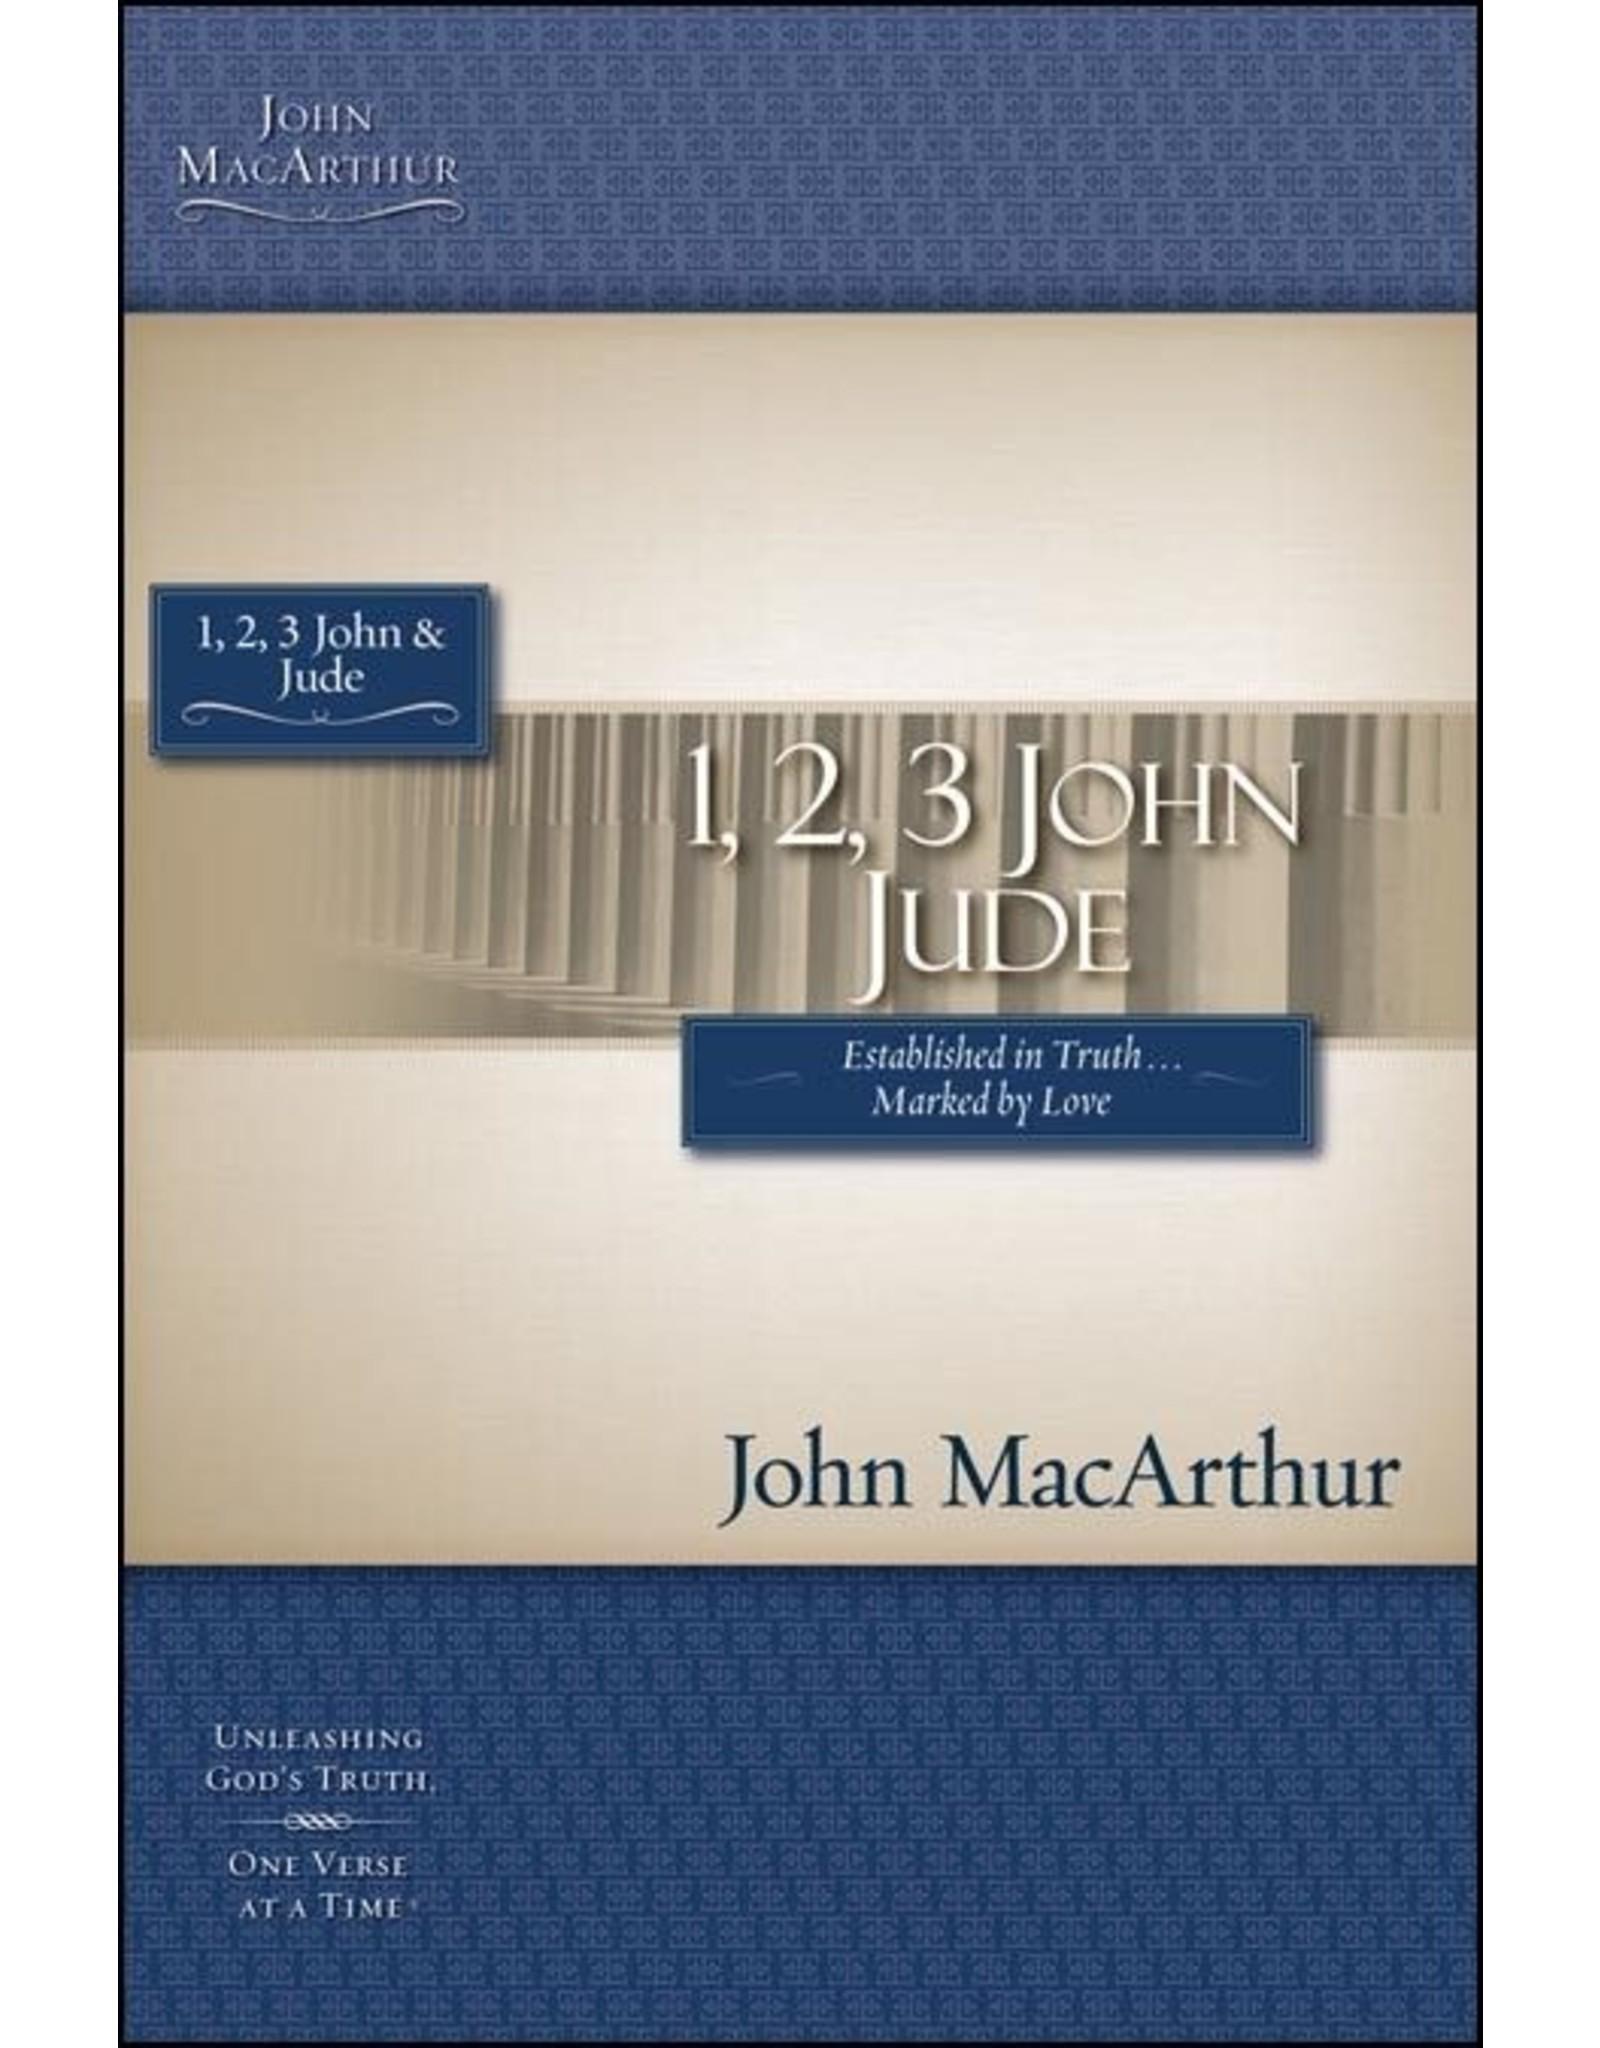 Harper Collins / Thomas Nelson / Zondervan (1st Ed.) MacArthur Bible Study: 1, 2, 3 John and Jude